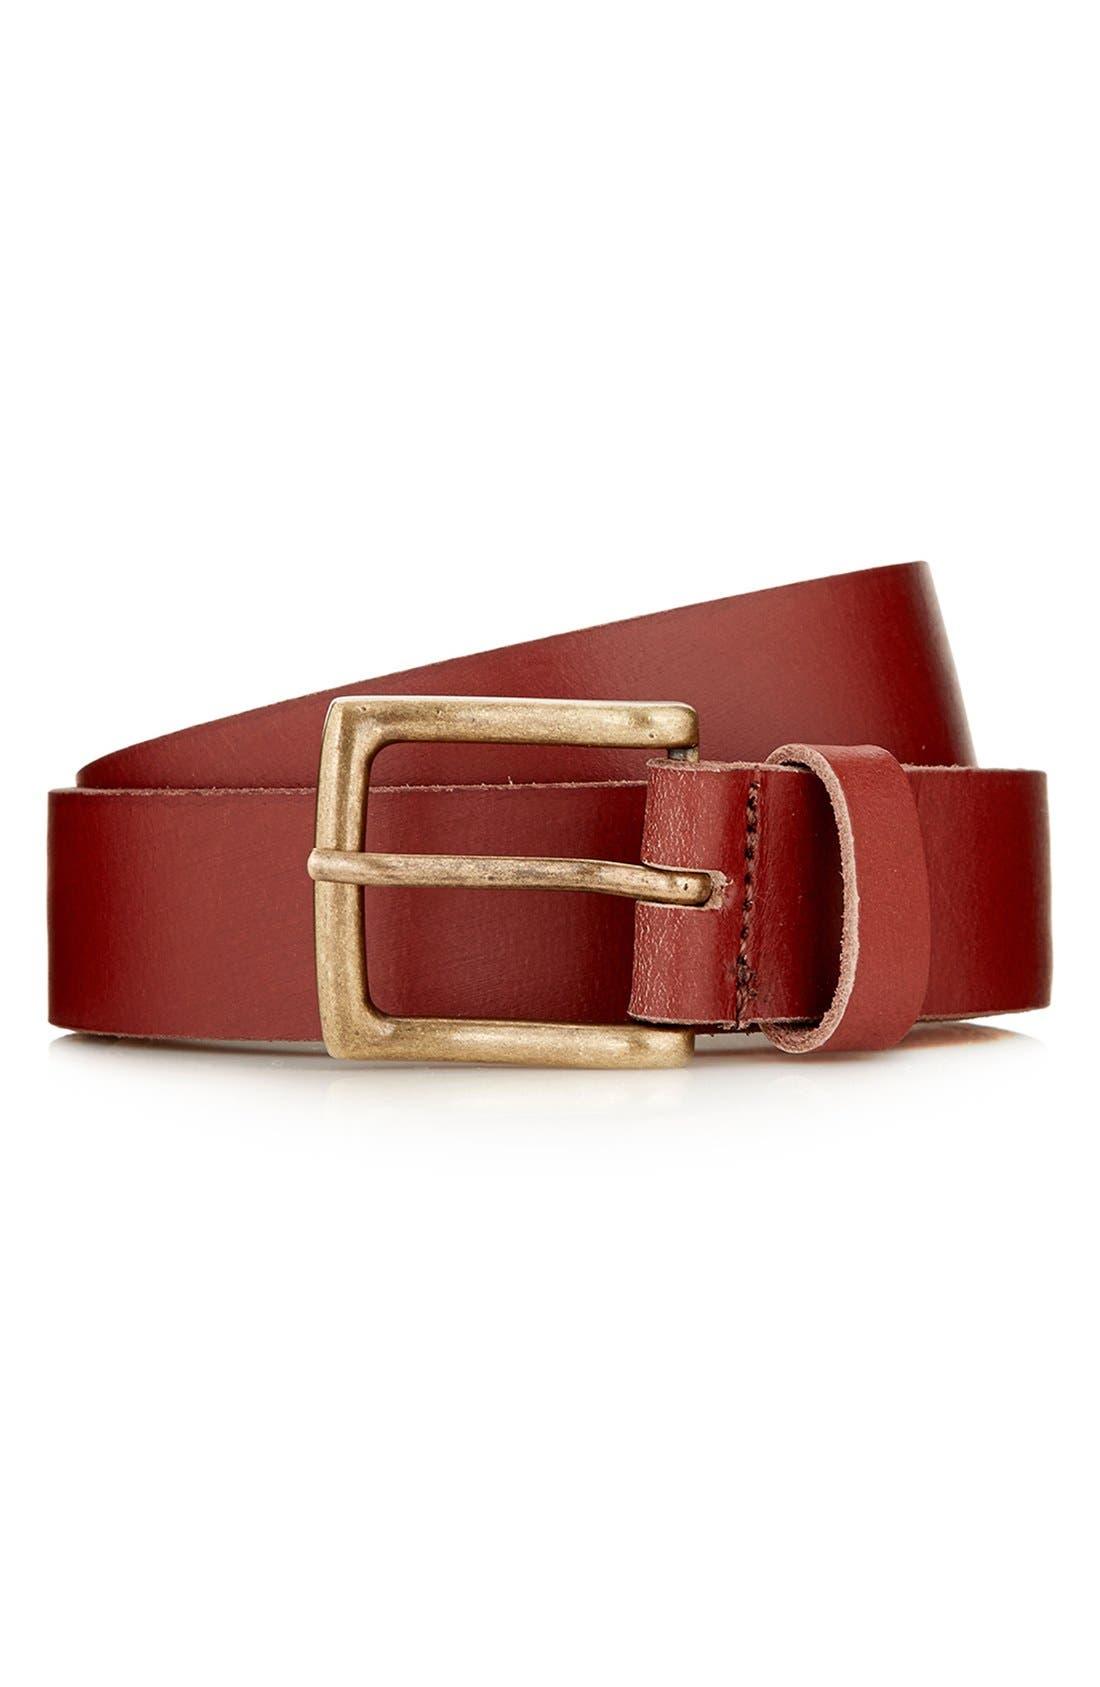 Main Image - Topman Brown Leather Belt